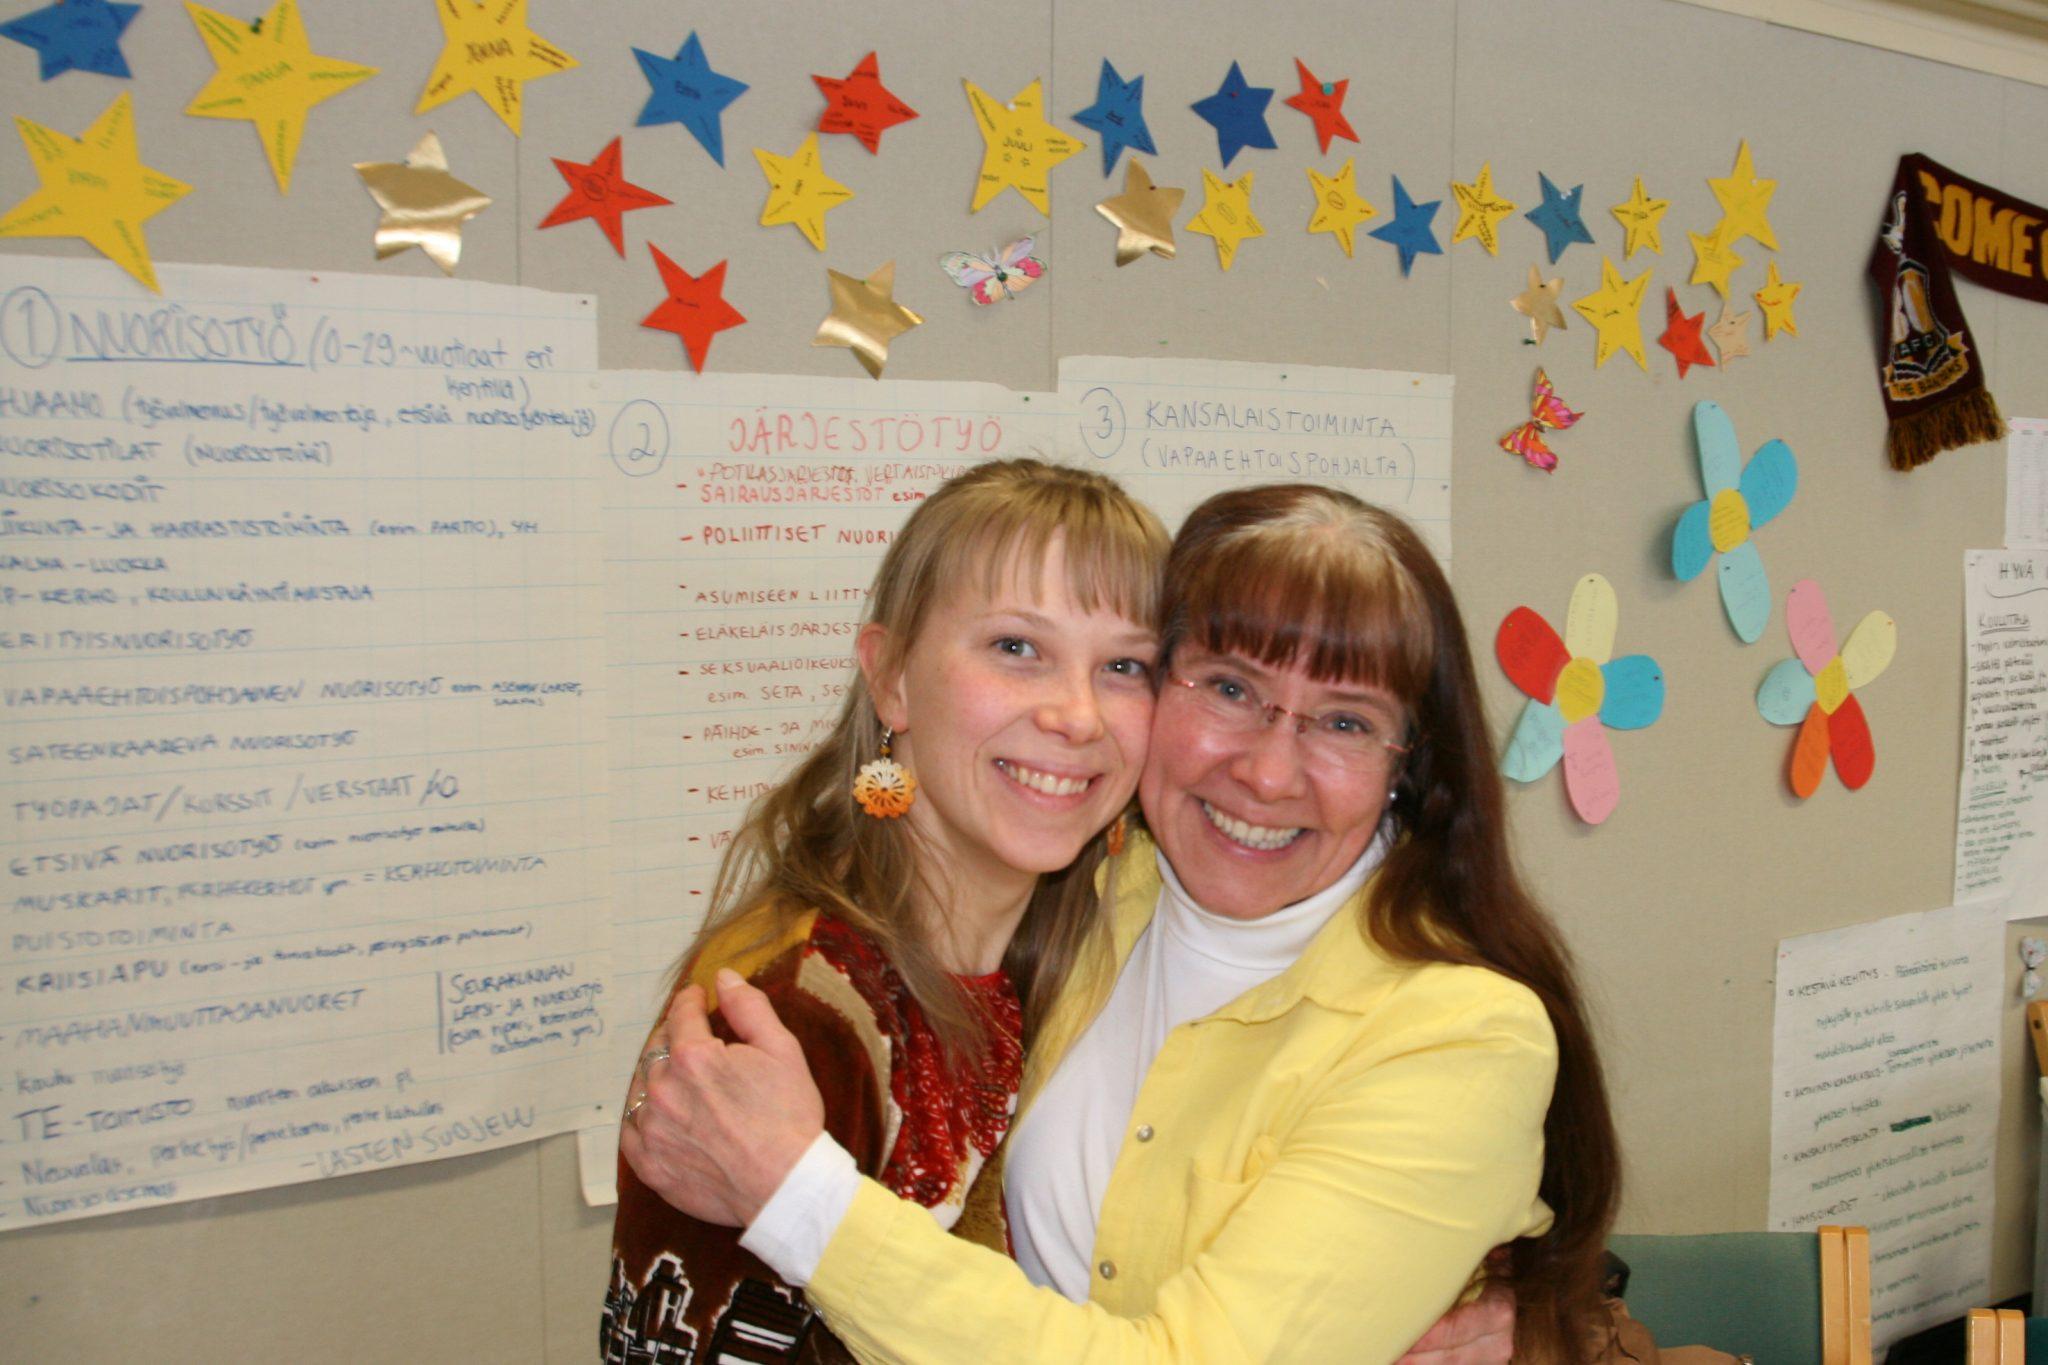 Vaalipaneelin juontajat Emma ja Merja